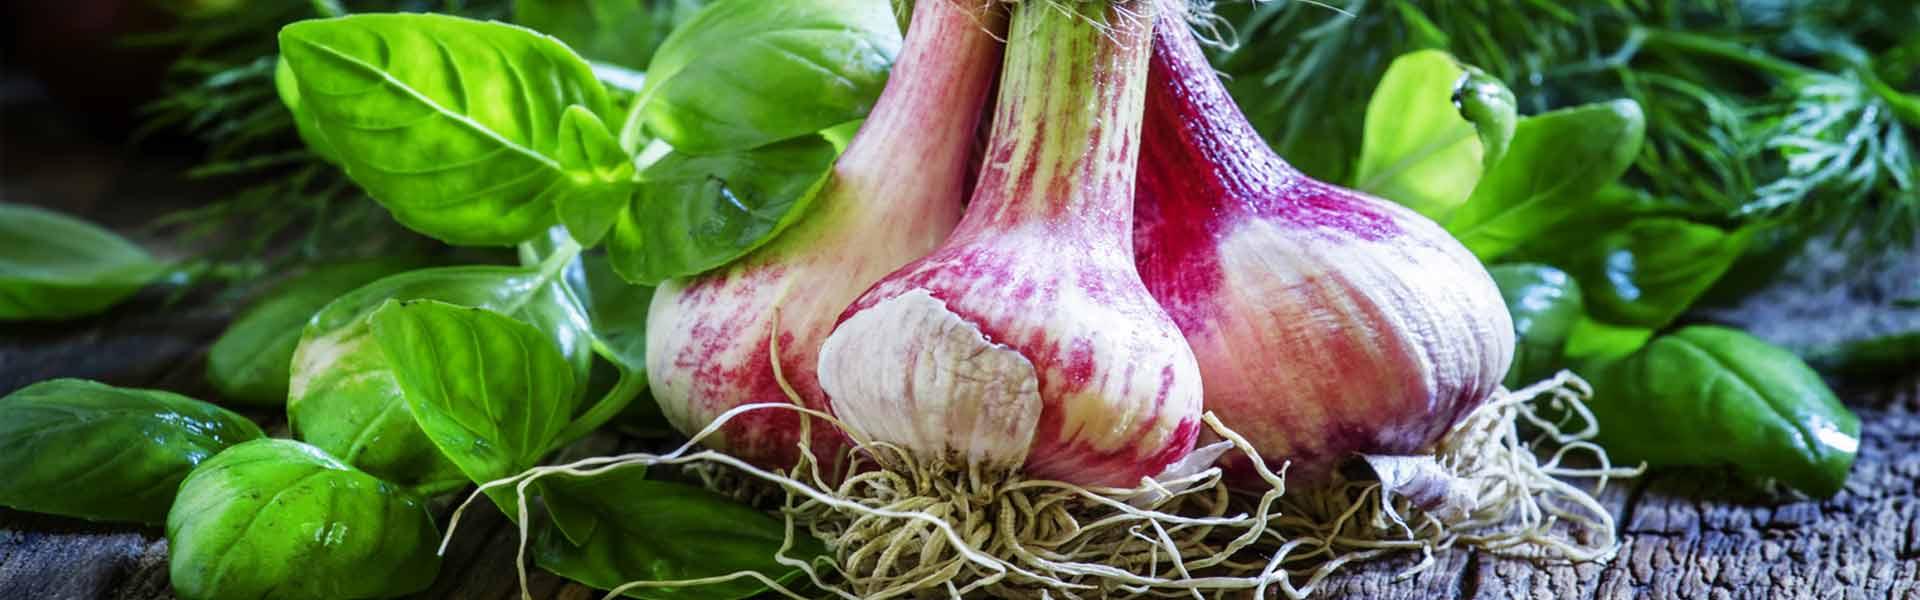 Kräuter_Gemüse_Gärtle